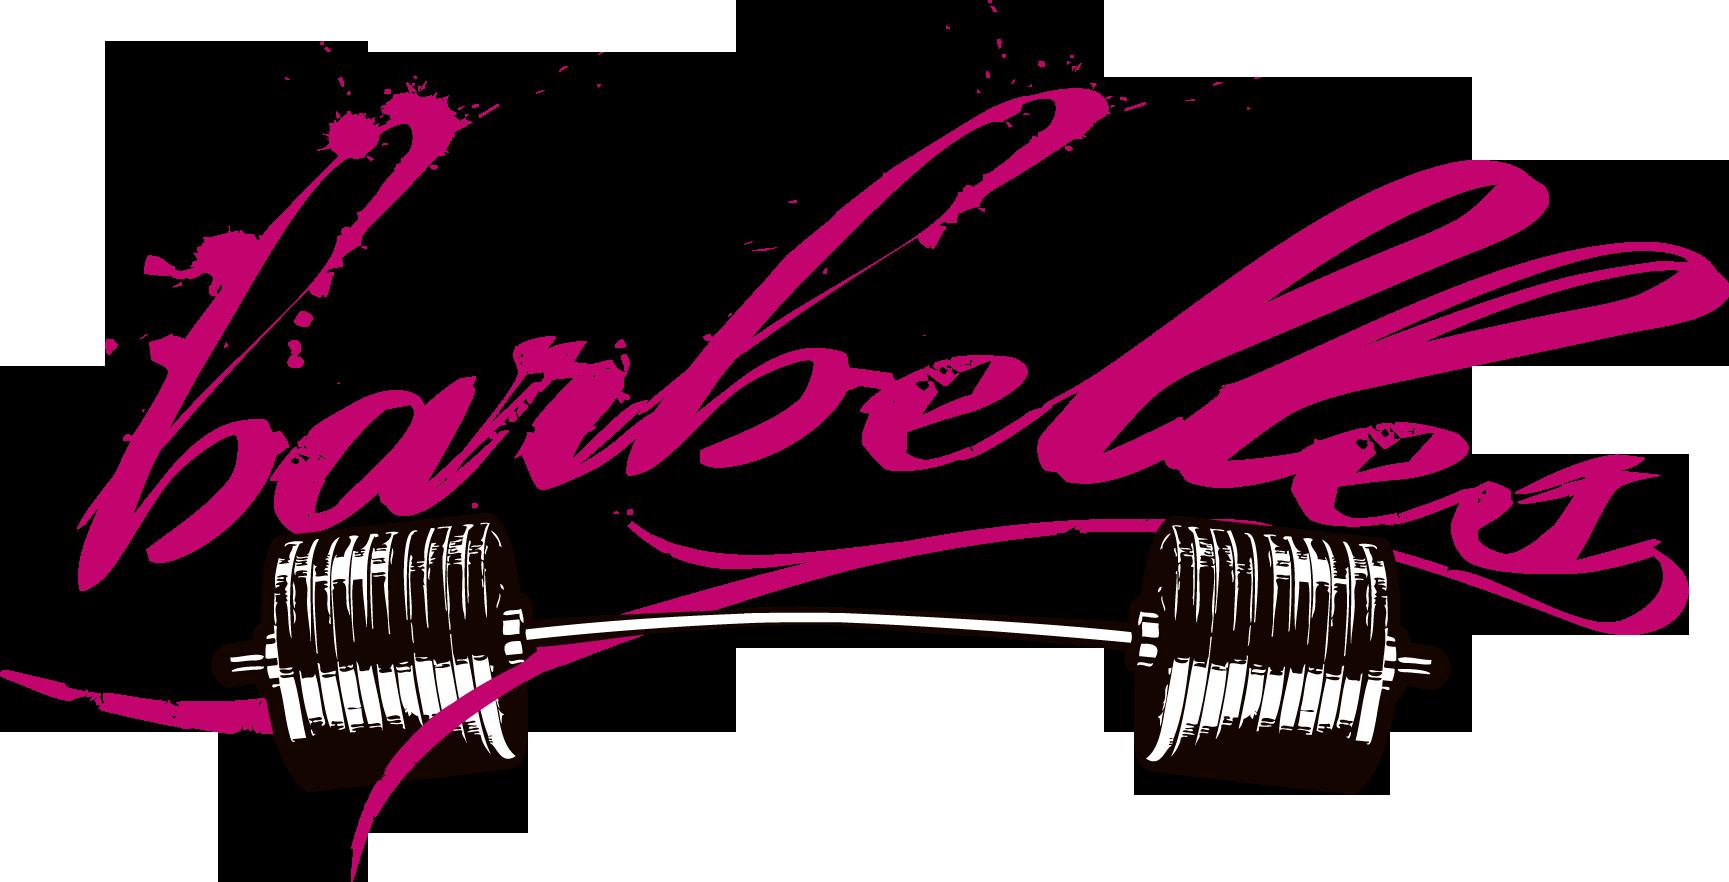 barbelles_female_lifting_network_isa_olsson.png